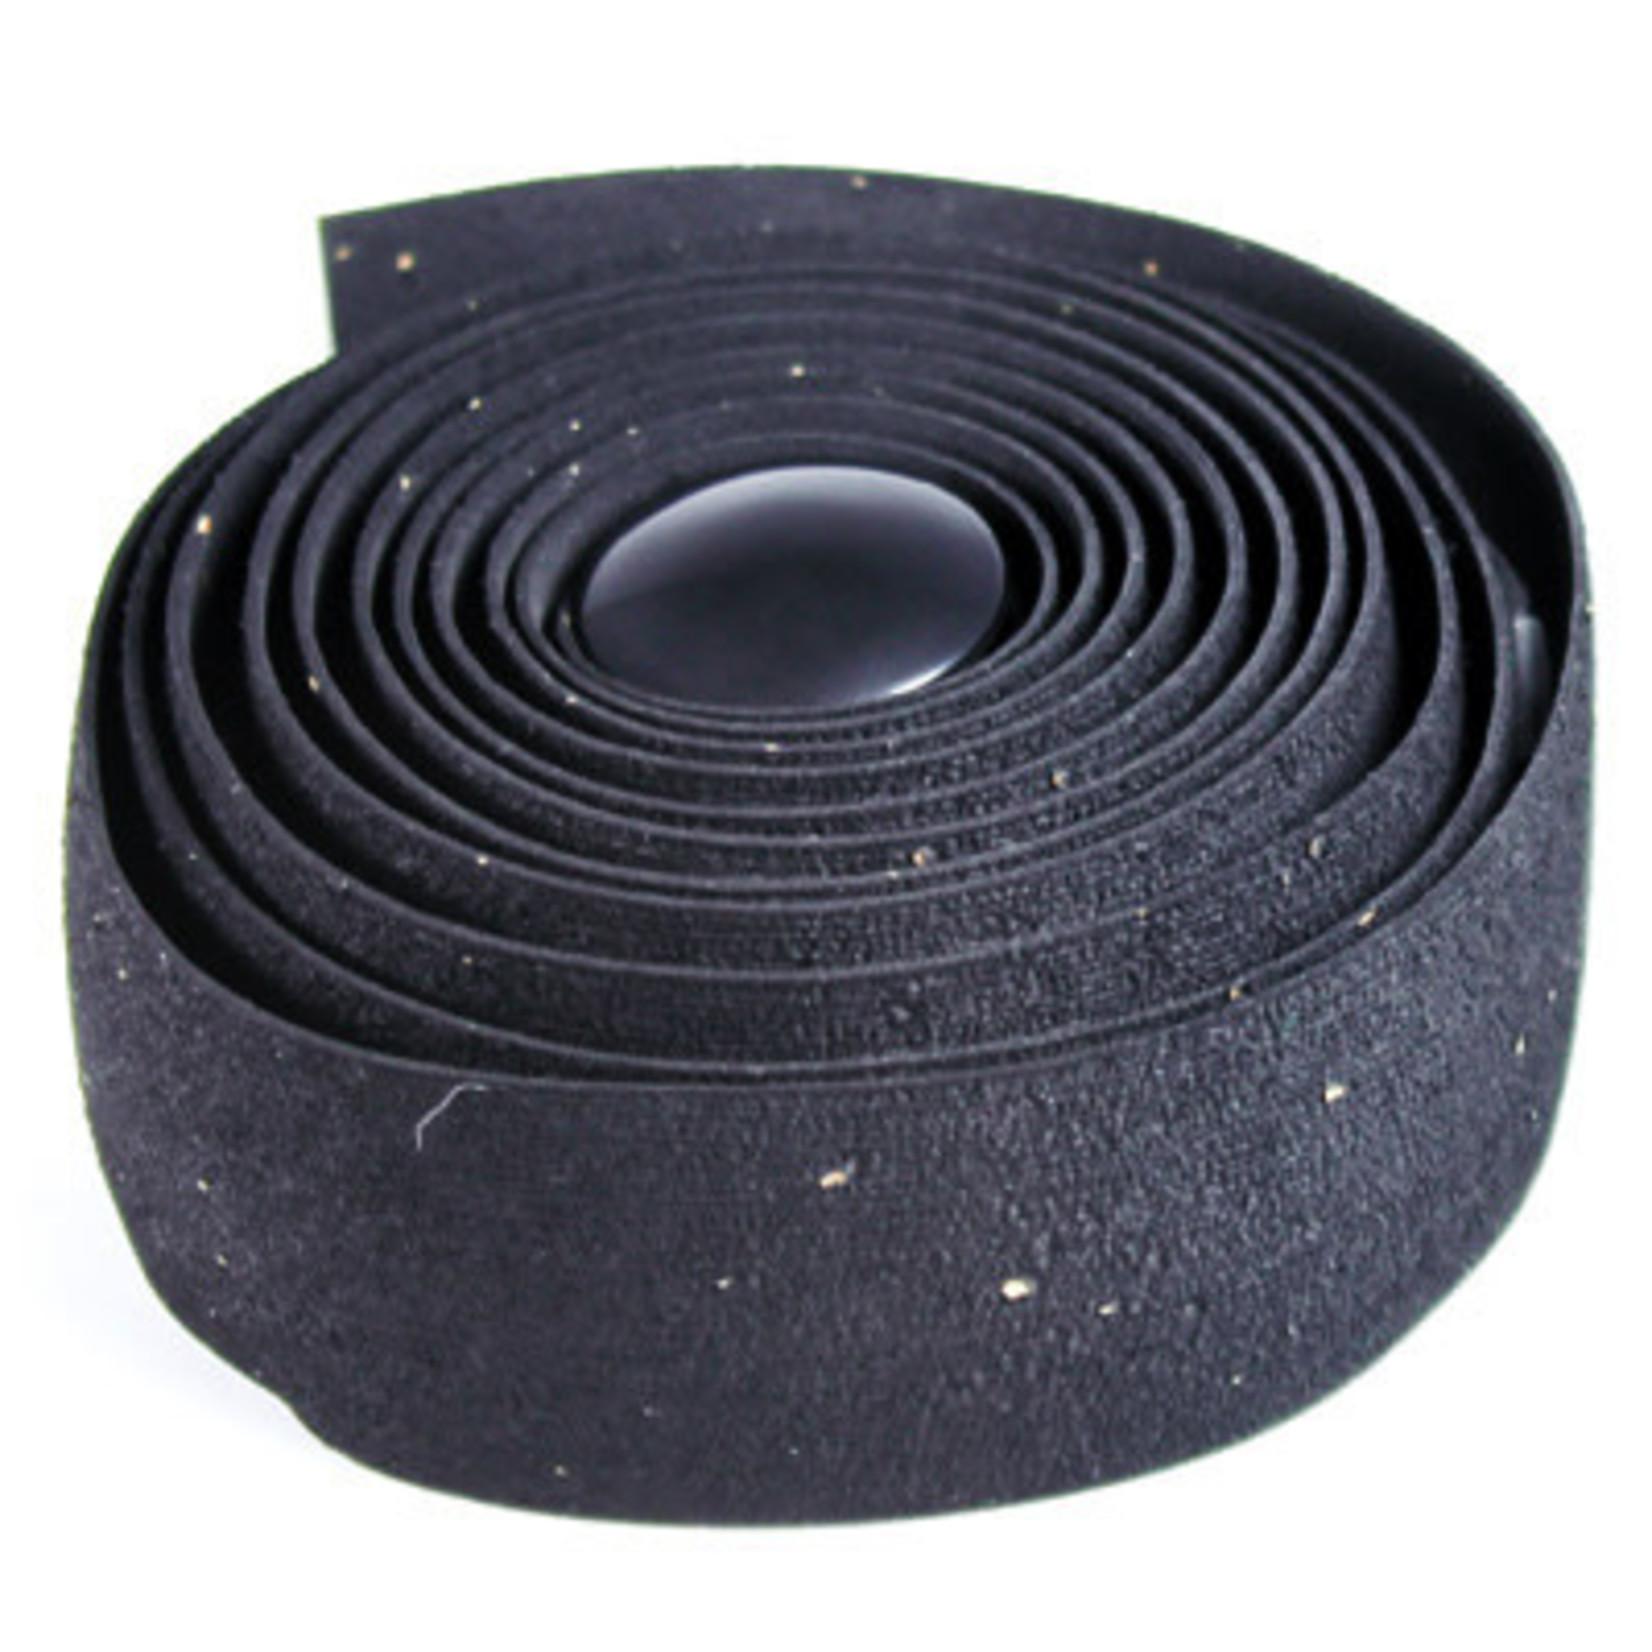 ULTRACYCLE KHS Q2 CLASSIC CORK BAR TAPE BLACK